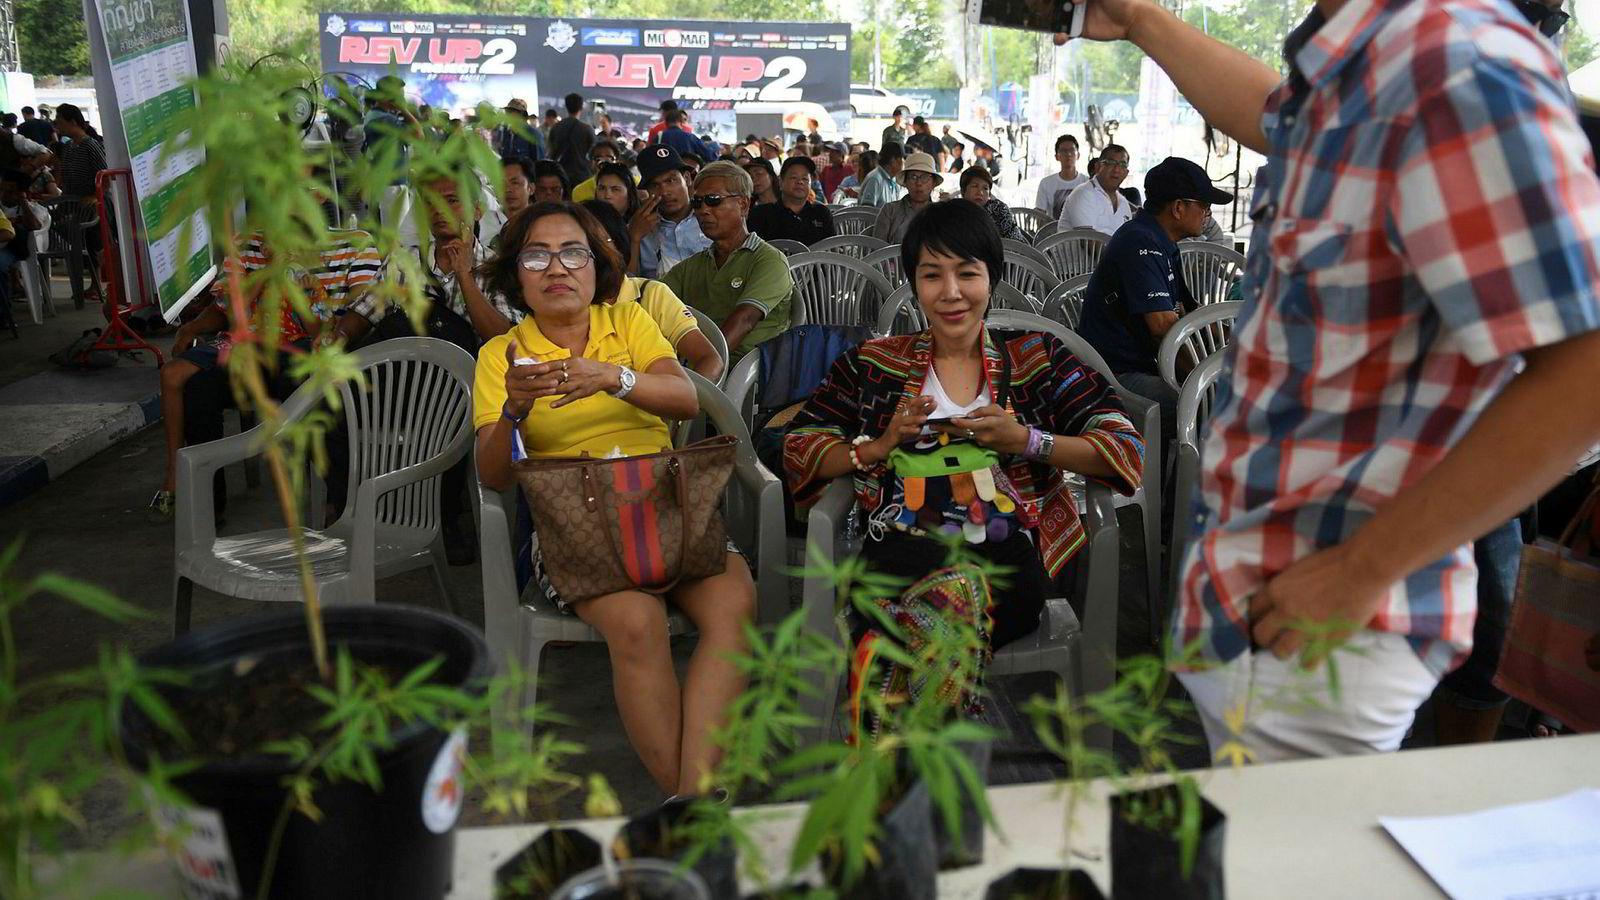 Medisinsk cannabisolje